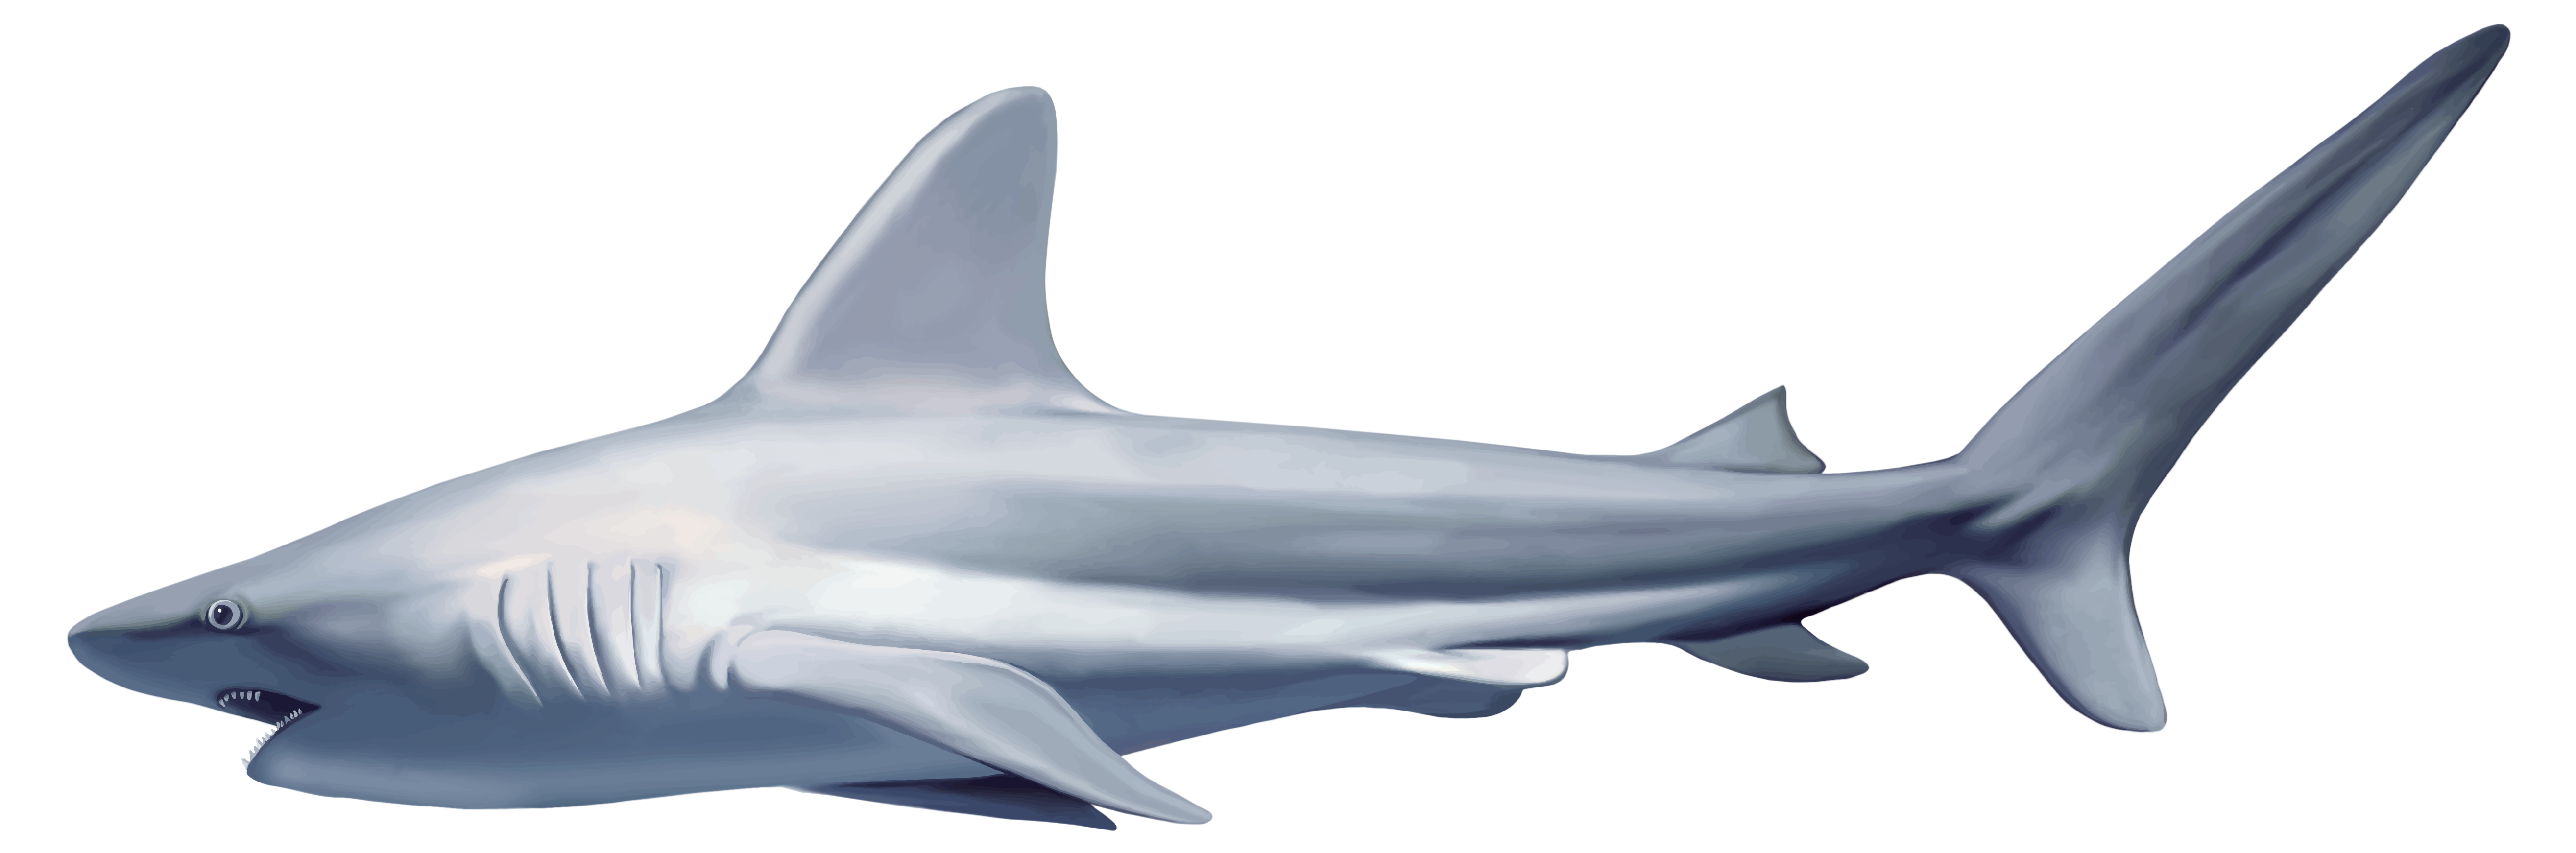 Shark PNG - 8643